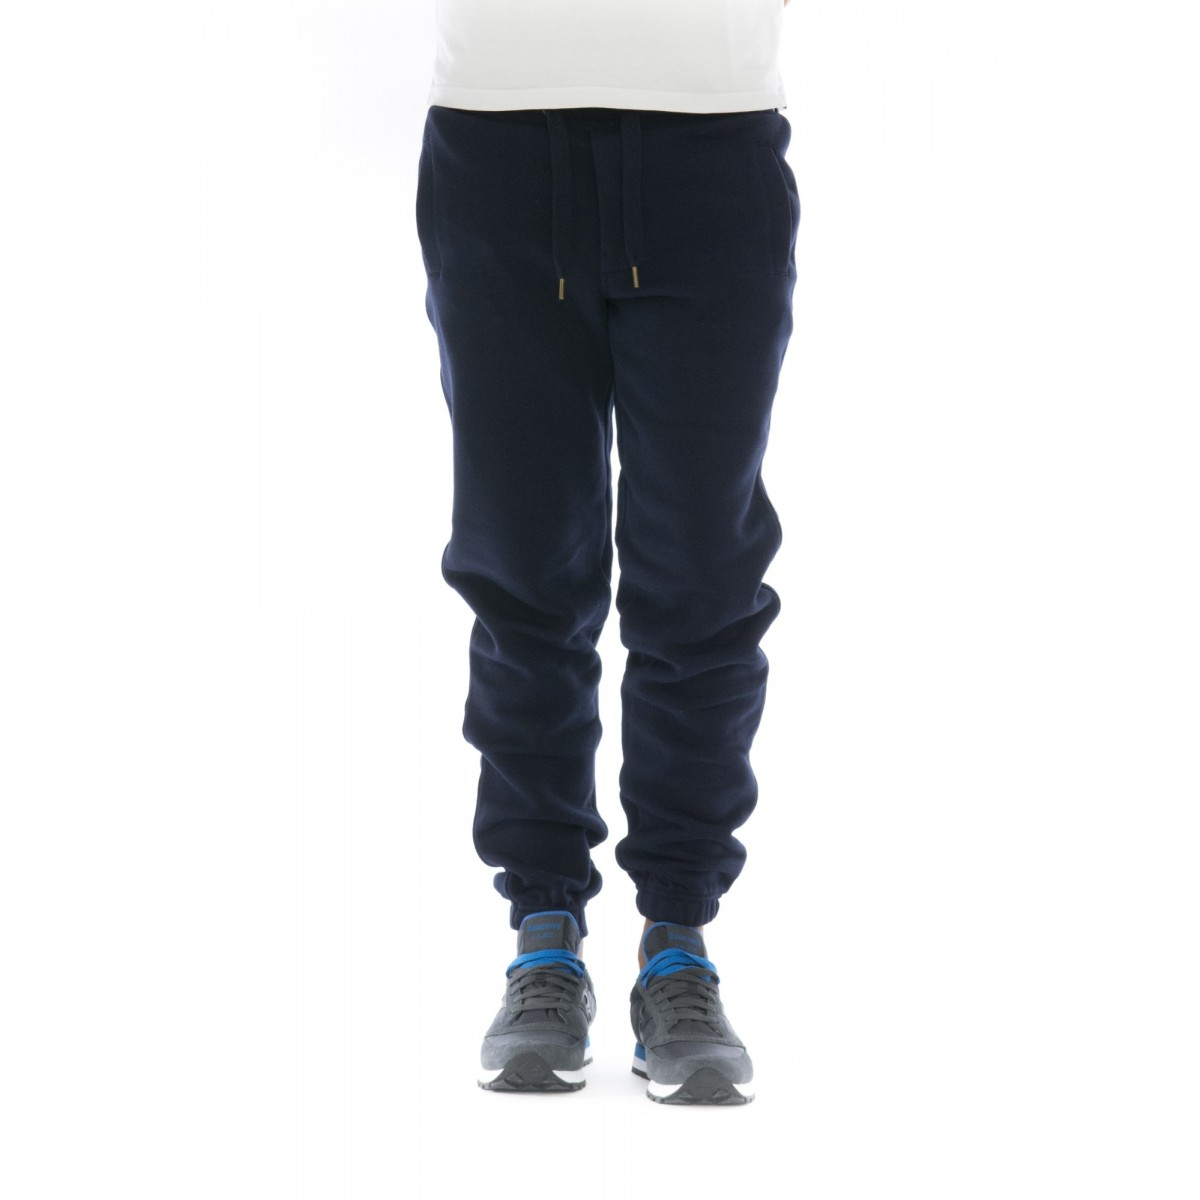 Pantalone uomo - F28124 pantalone tuta jogging